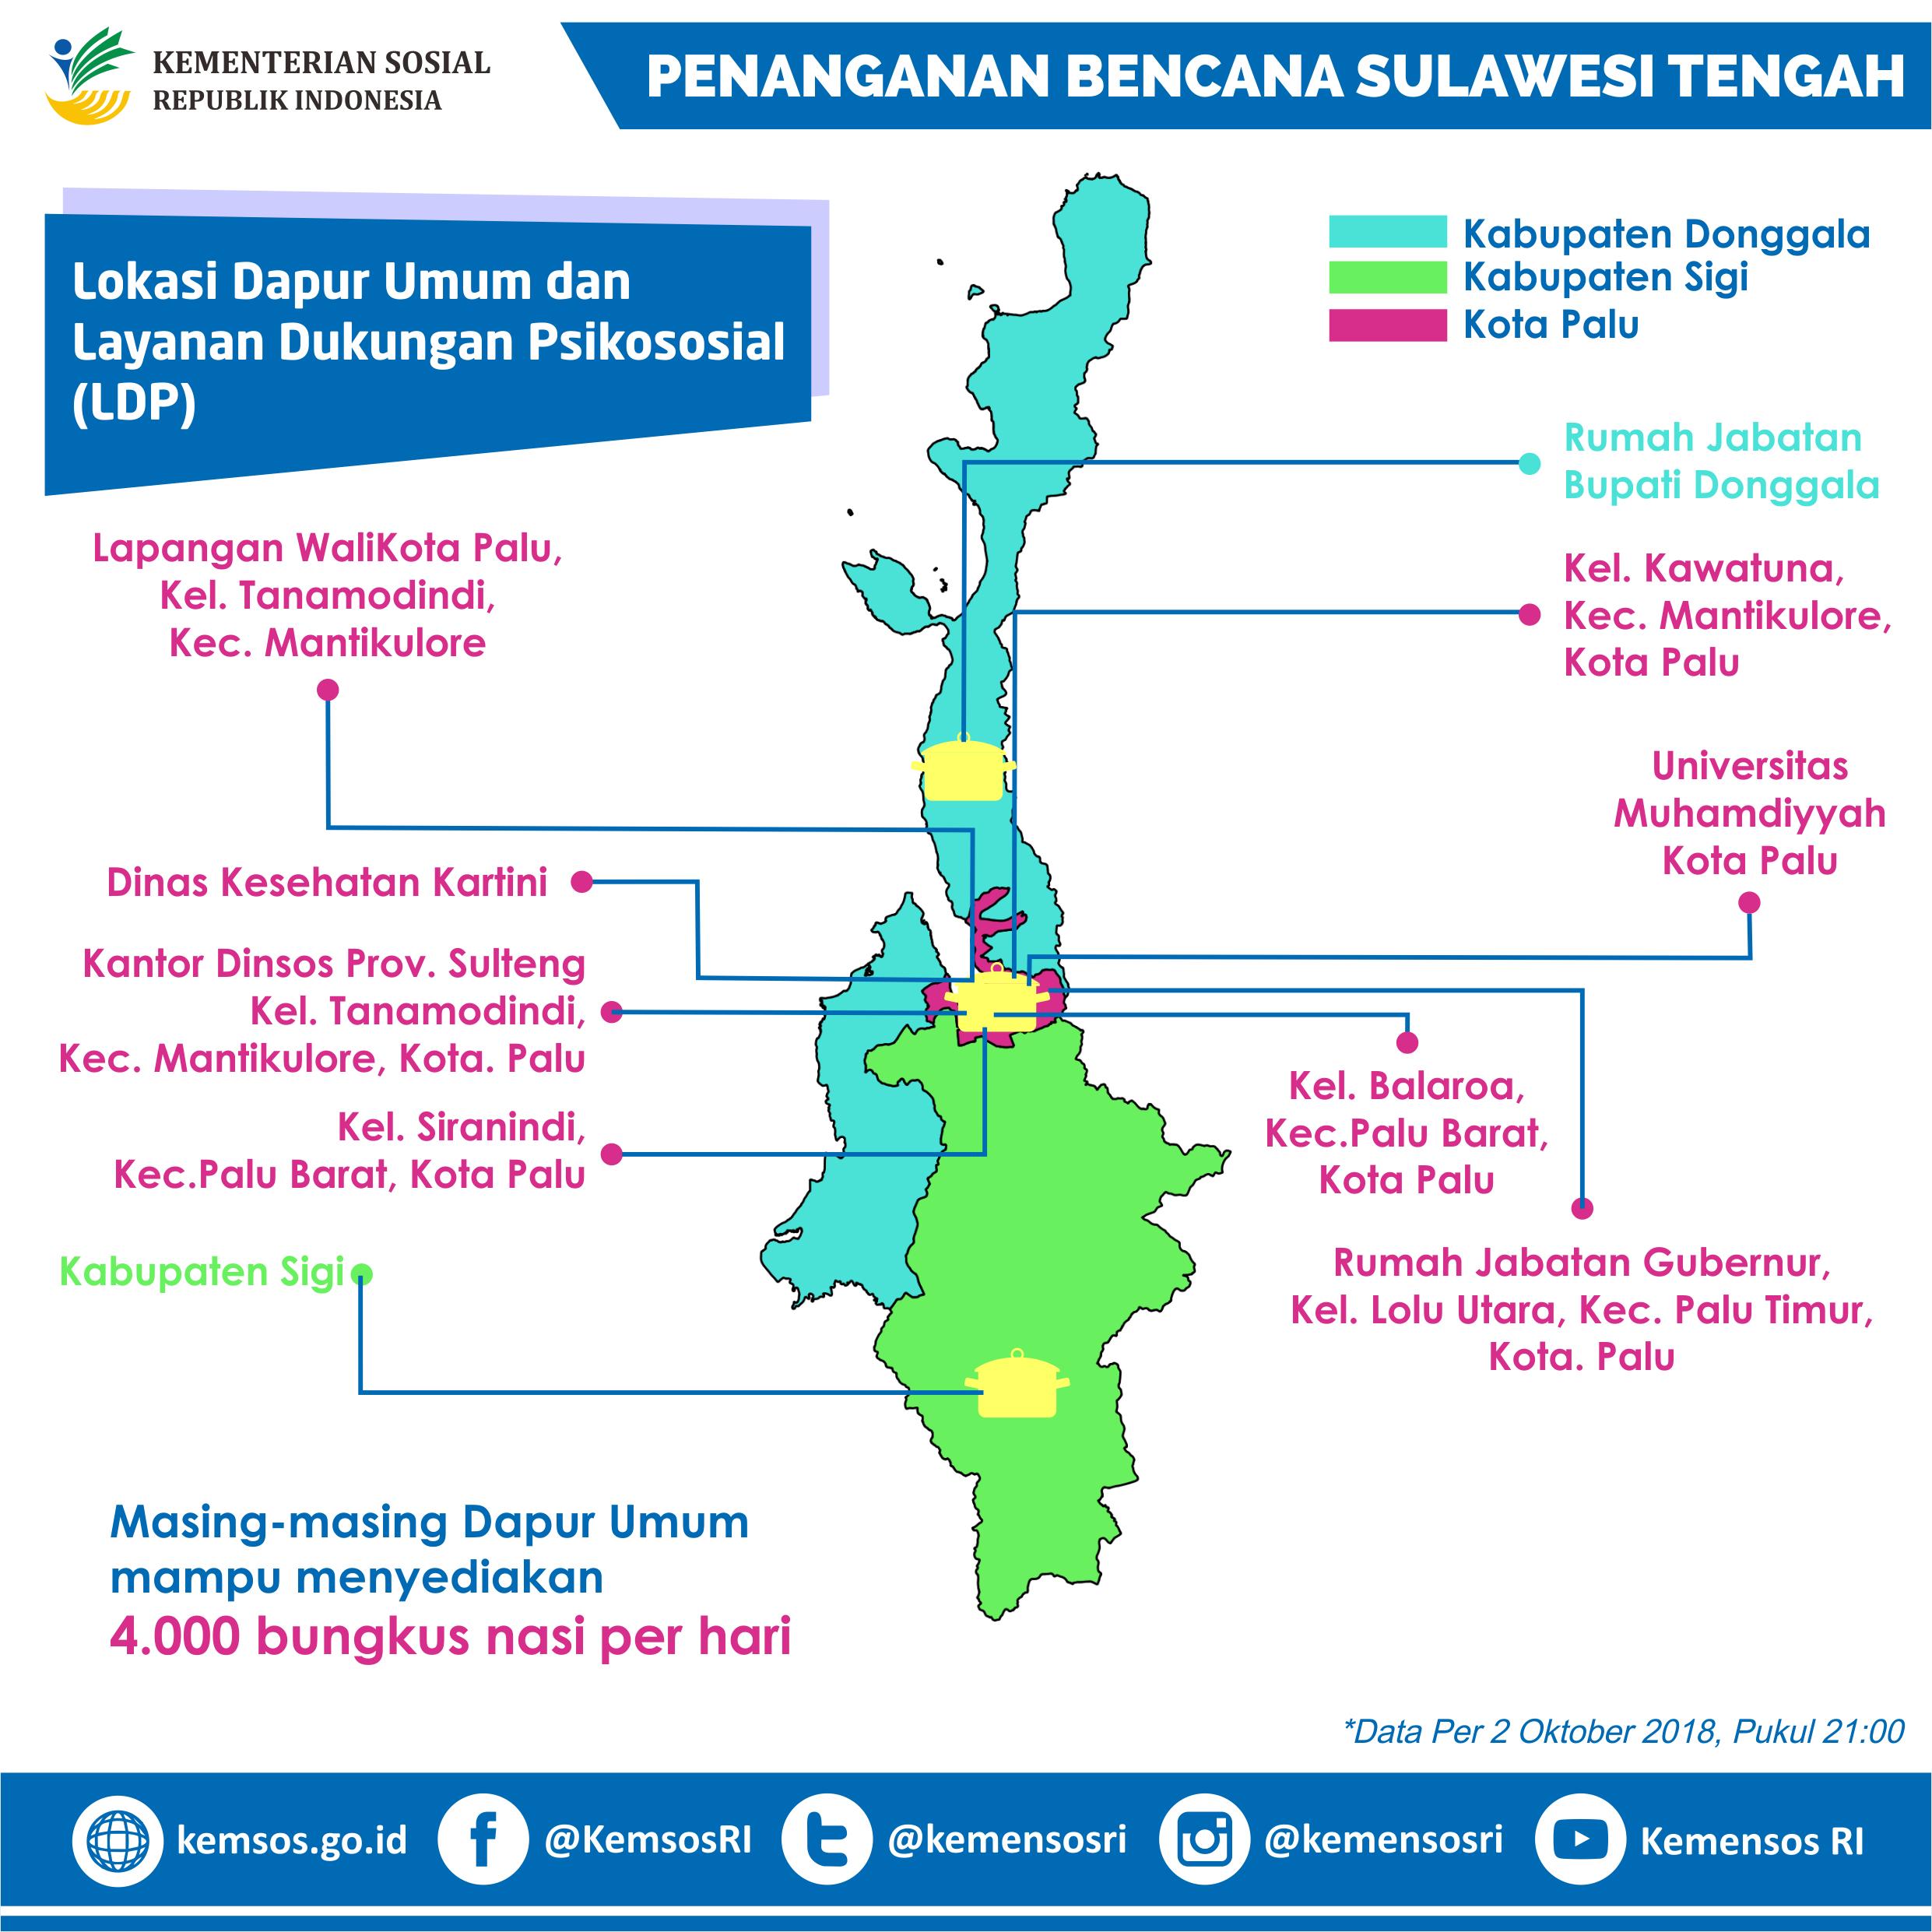 """Update"" Penanganan Bencana Sulawesi Tengah"